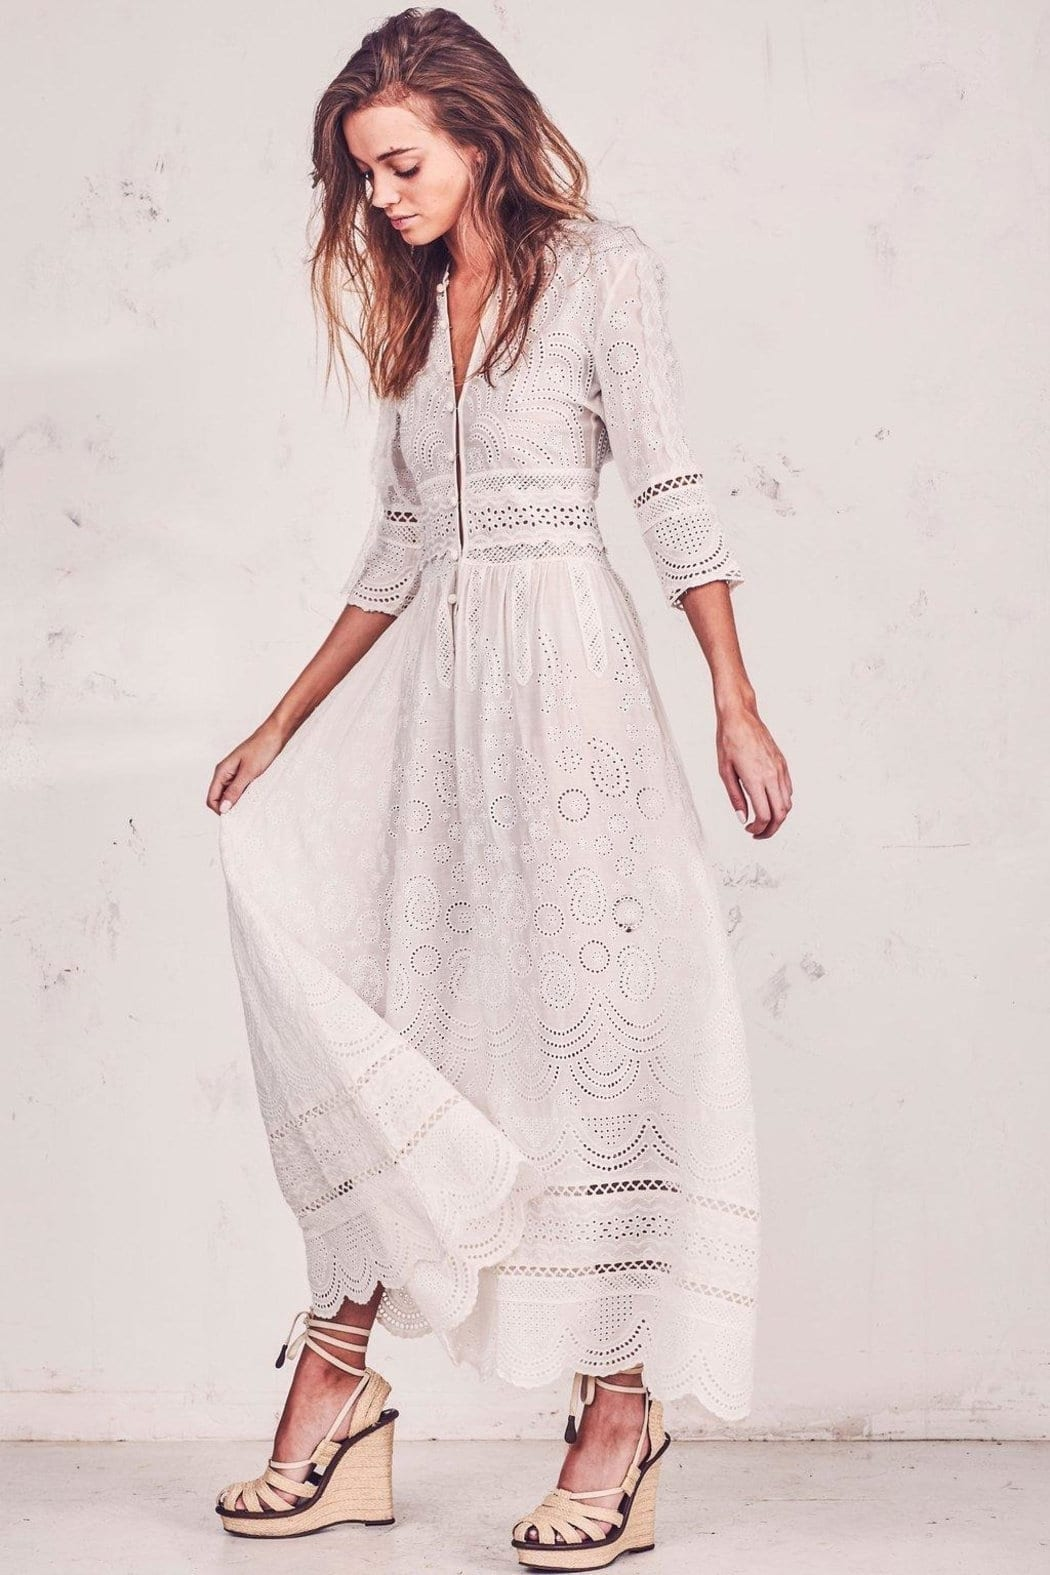 NEPTUNES Caroline White Dress